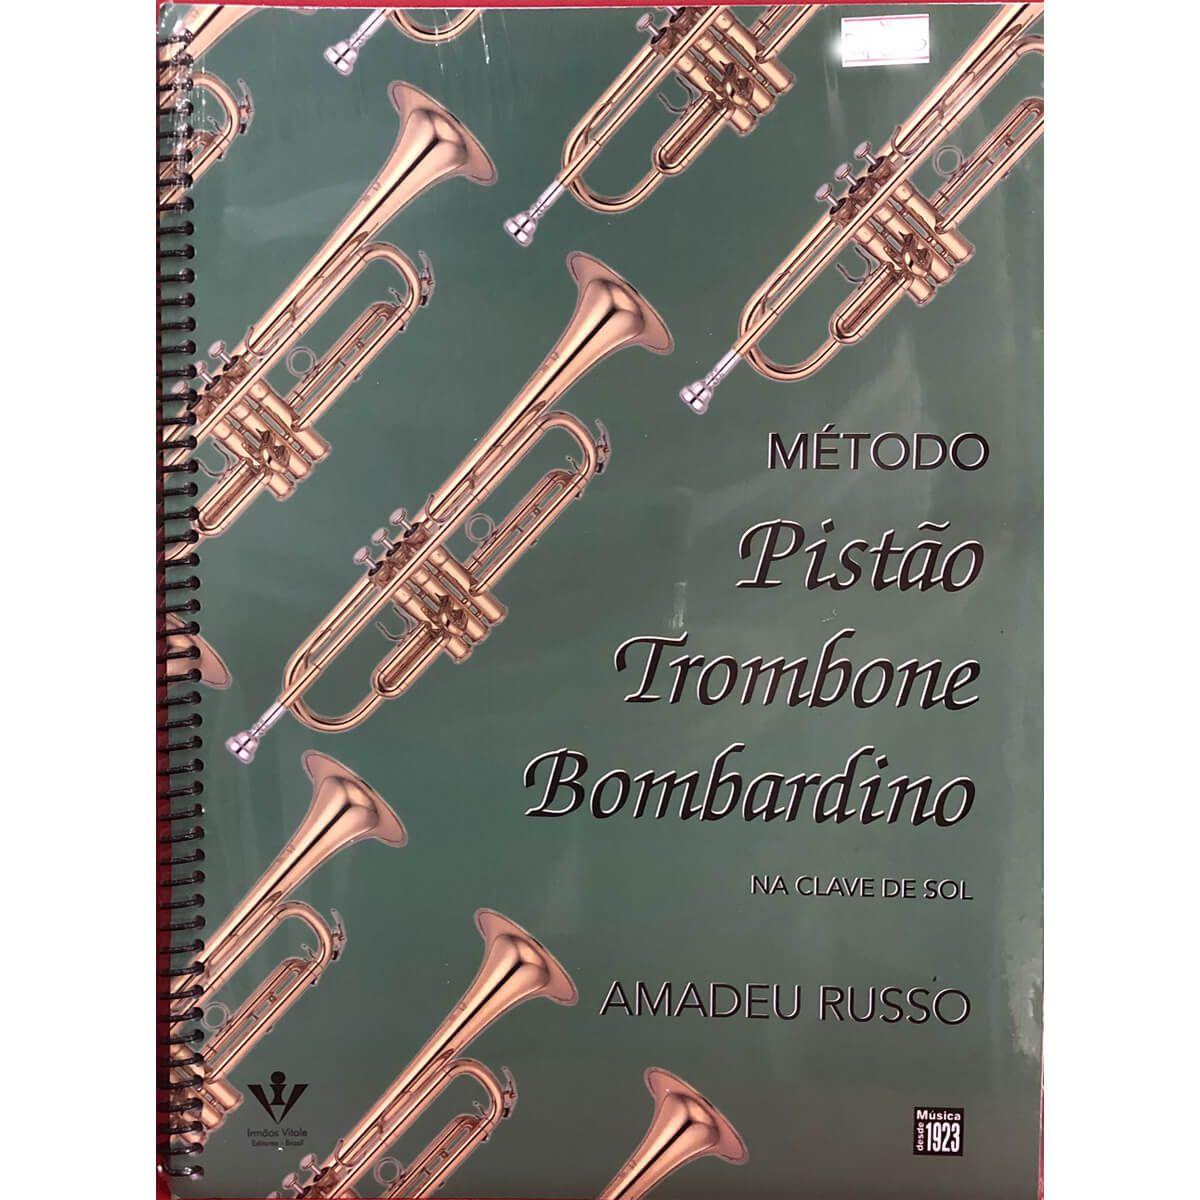 Método - Amadeu Russo - Trompete, Bombardino E Tuba